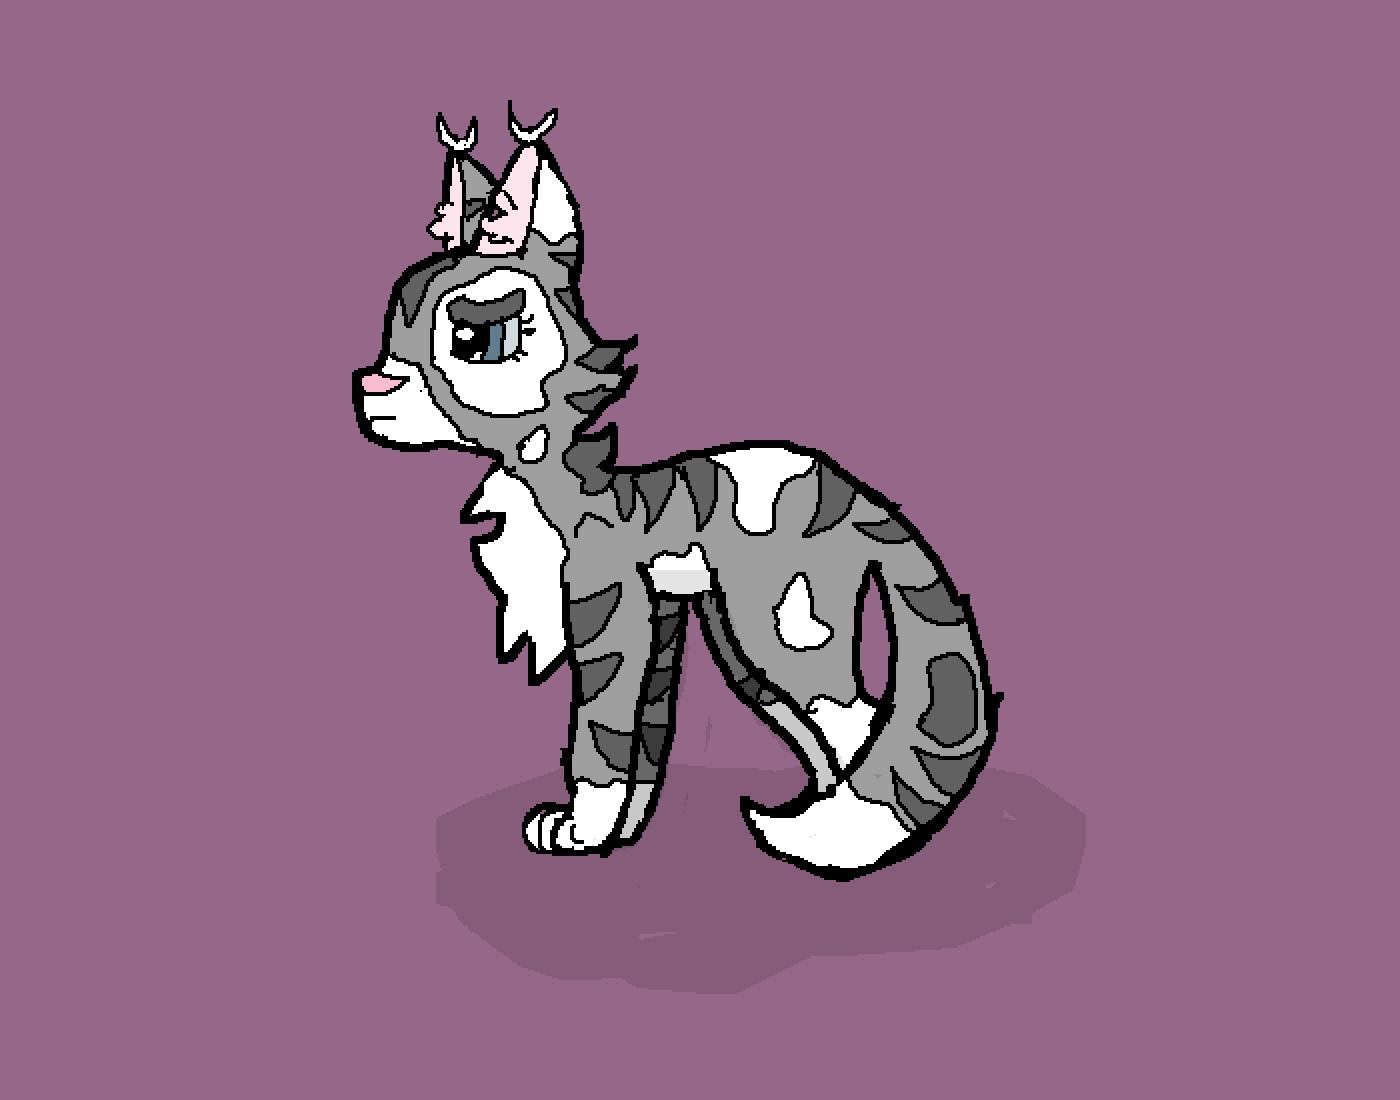 NAME HER by IvyHasSpirit